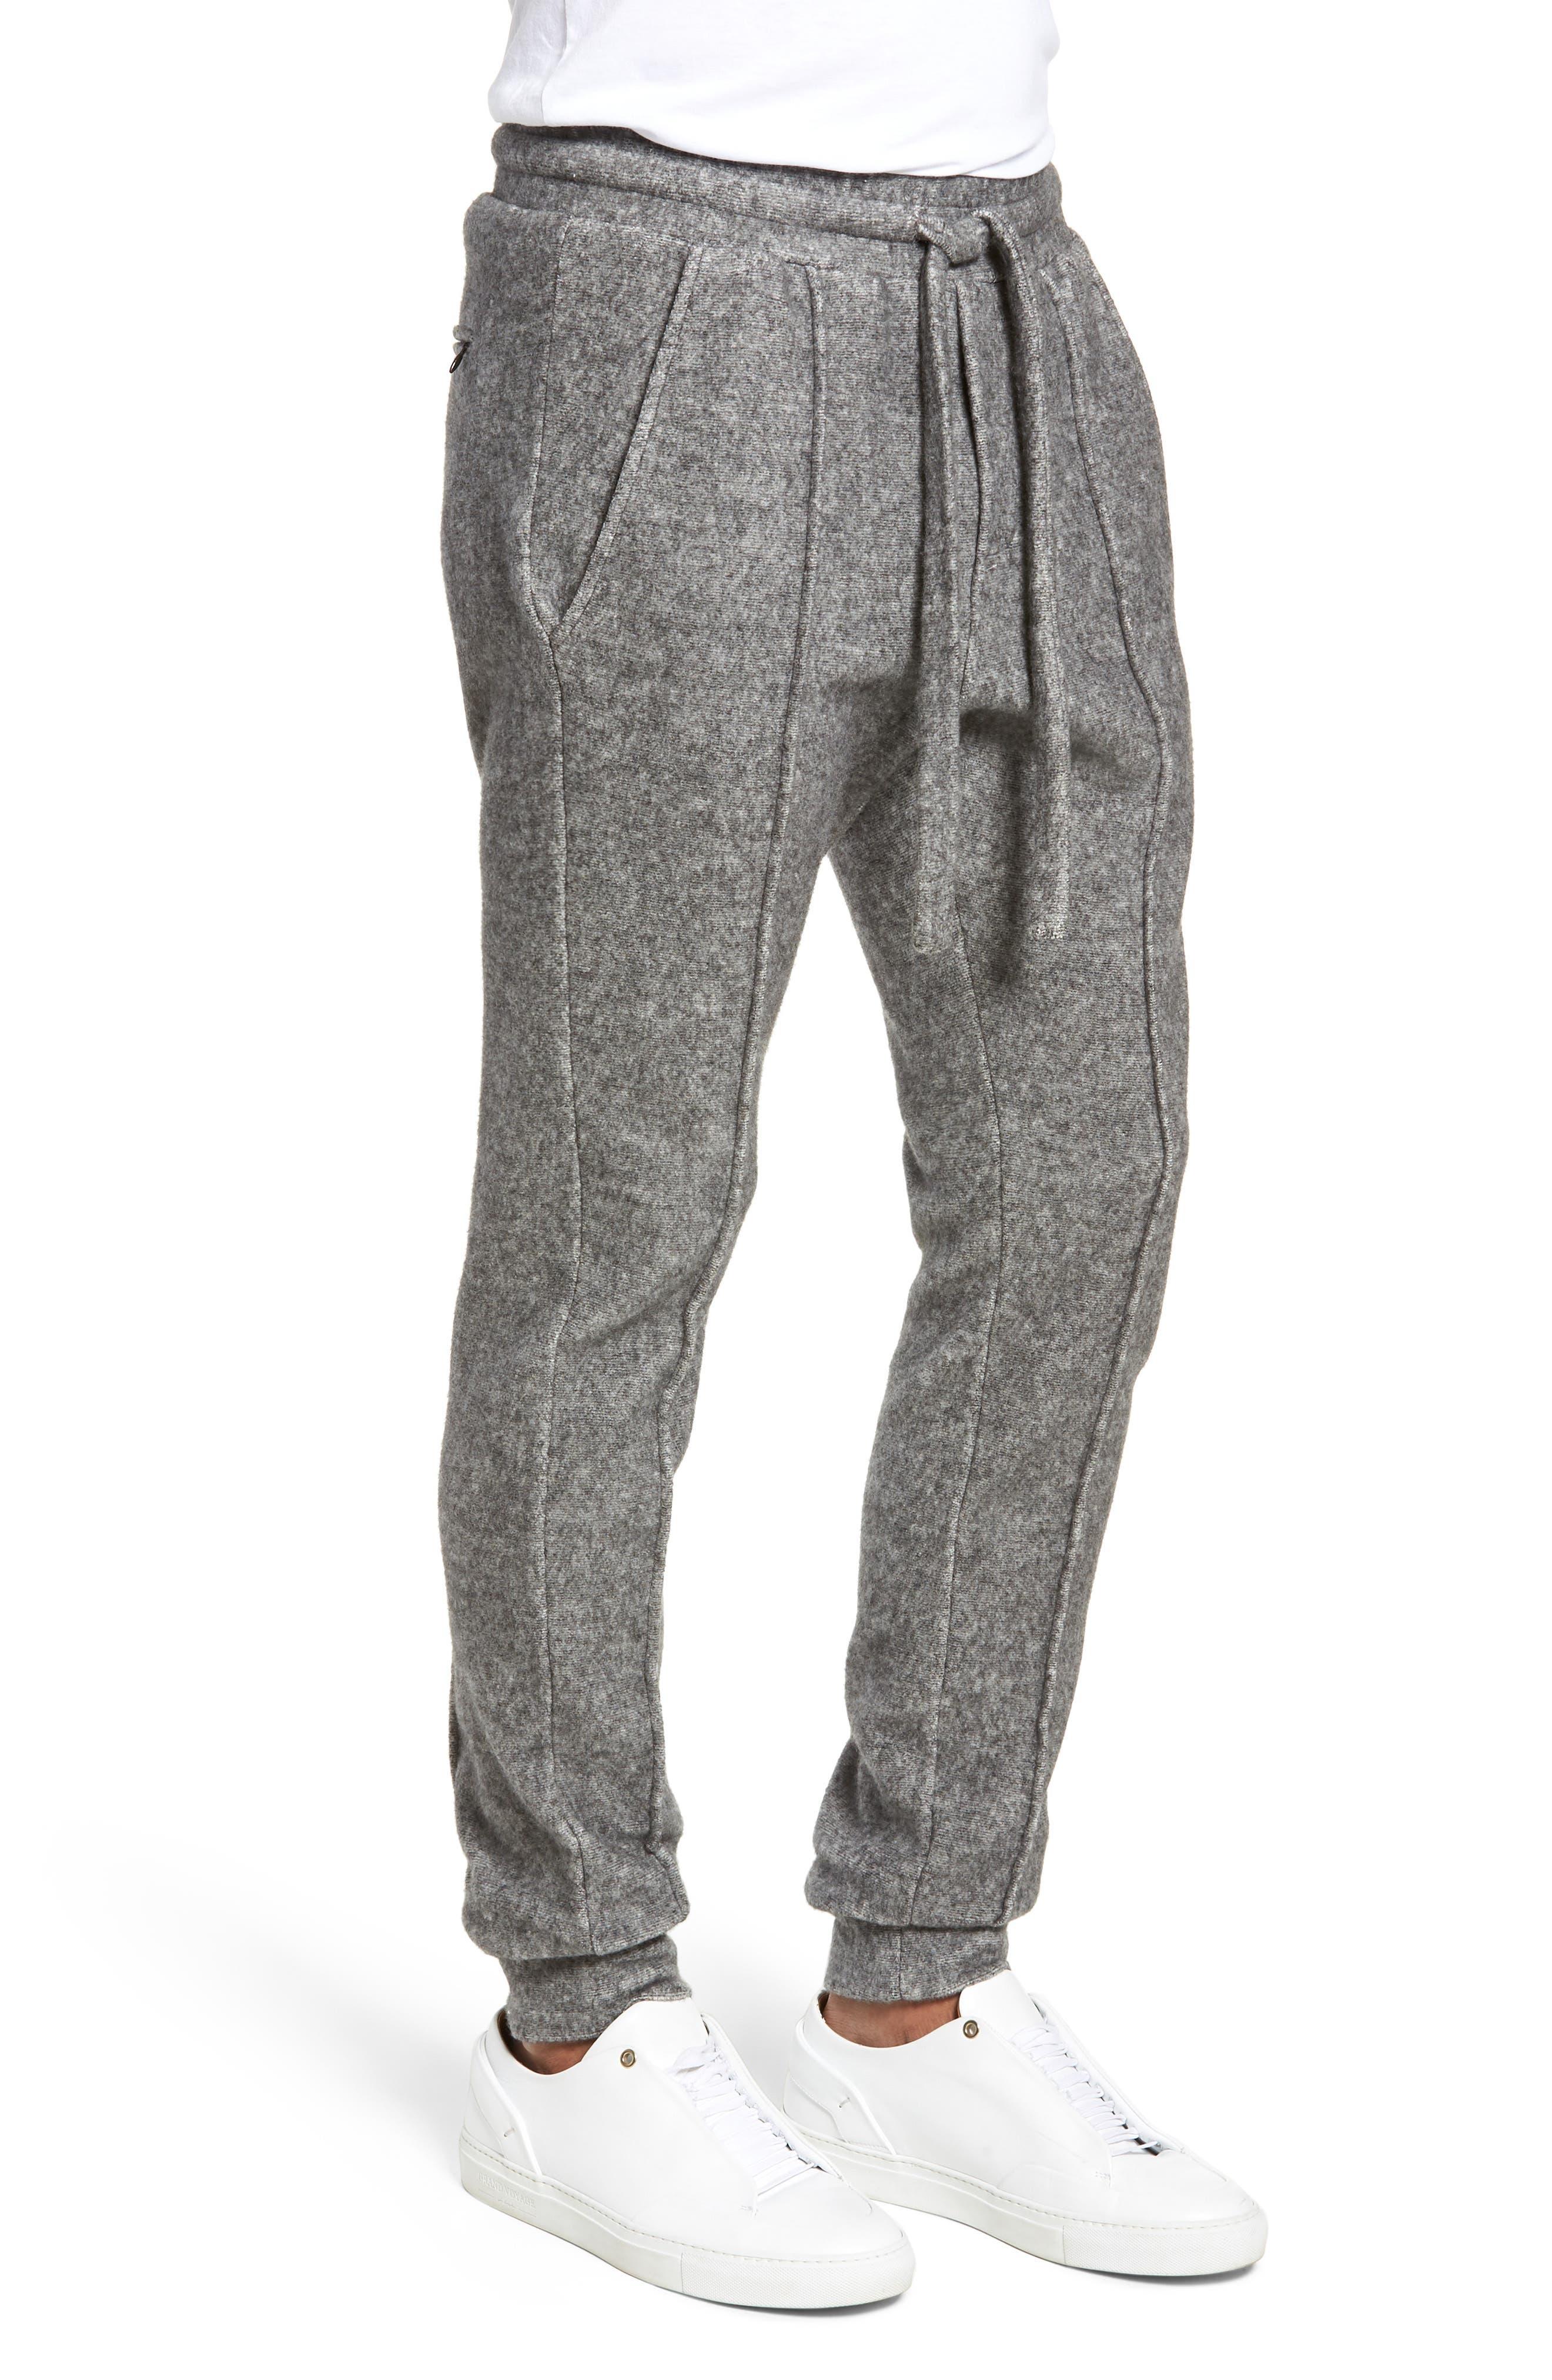 Maddux Slim Fit Jogger Pants,                             Alternate thumbnail 3, color,                             HEATHER GREY